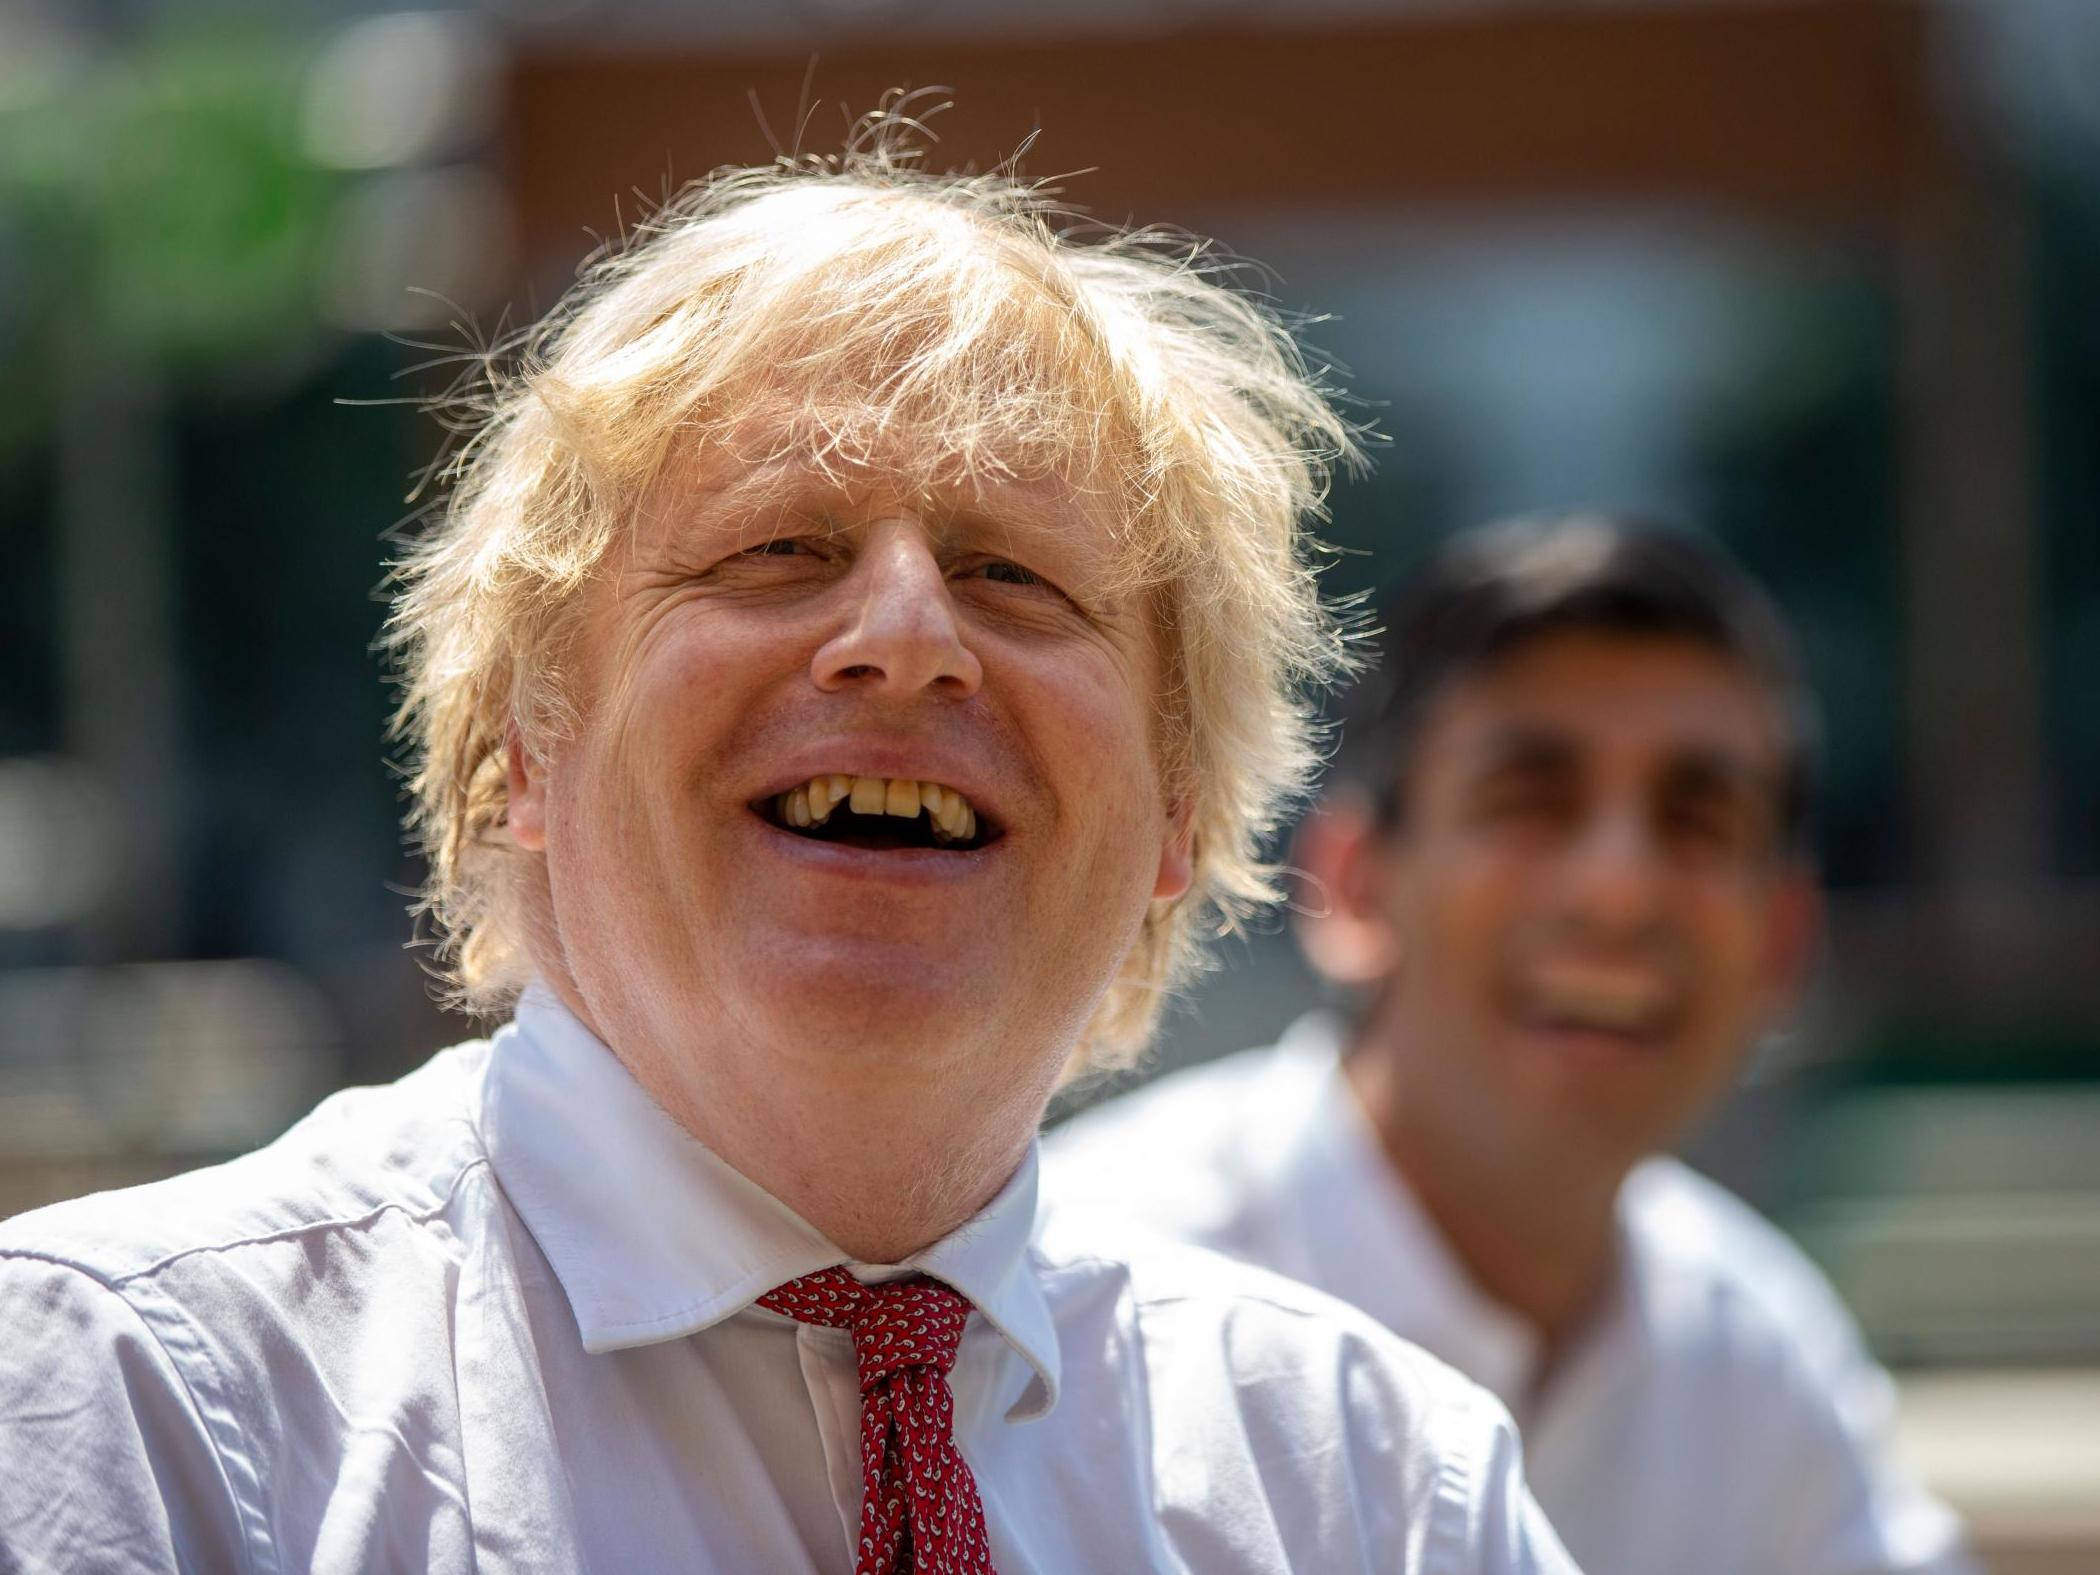 Boris Johnson's handling of coronavirus is being adapted into a TV drama thumbnail